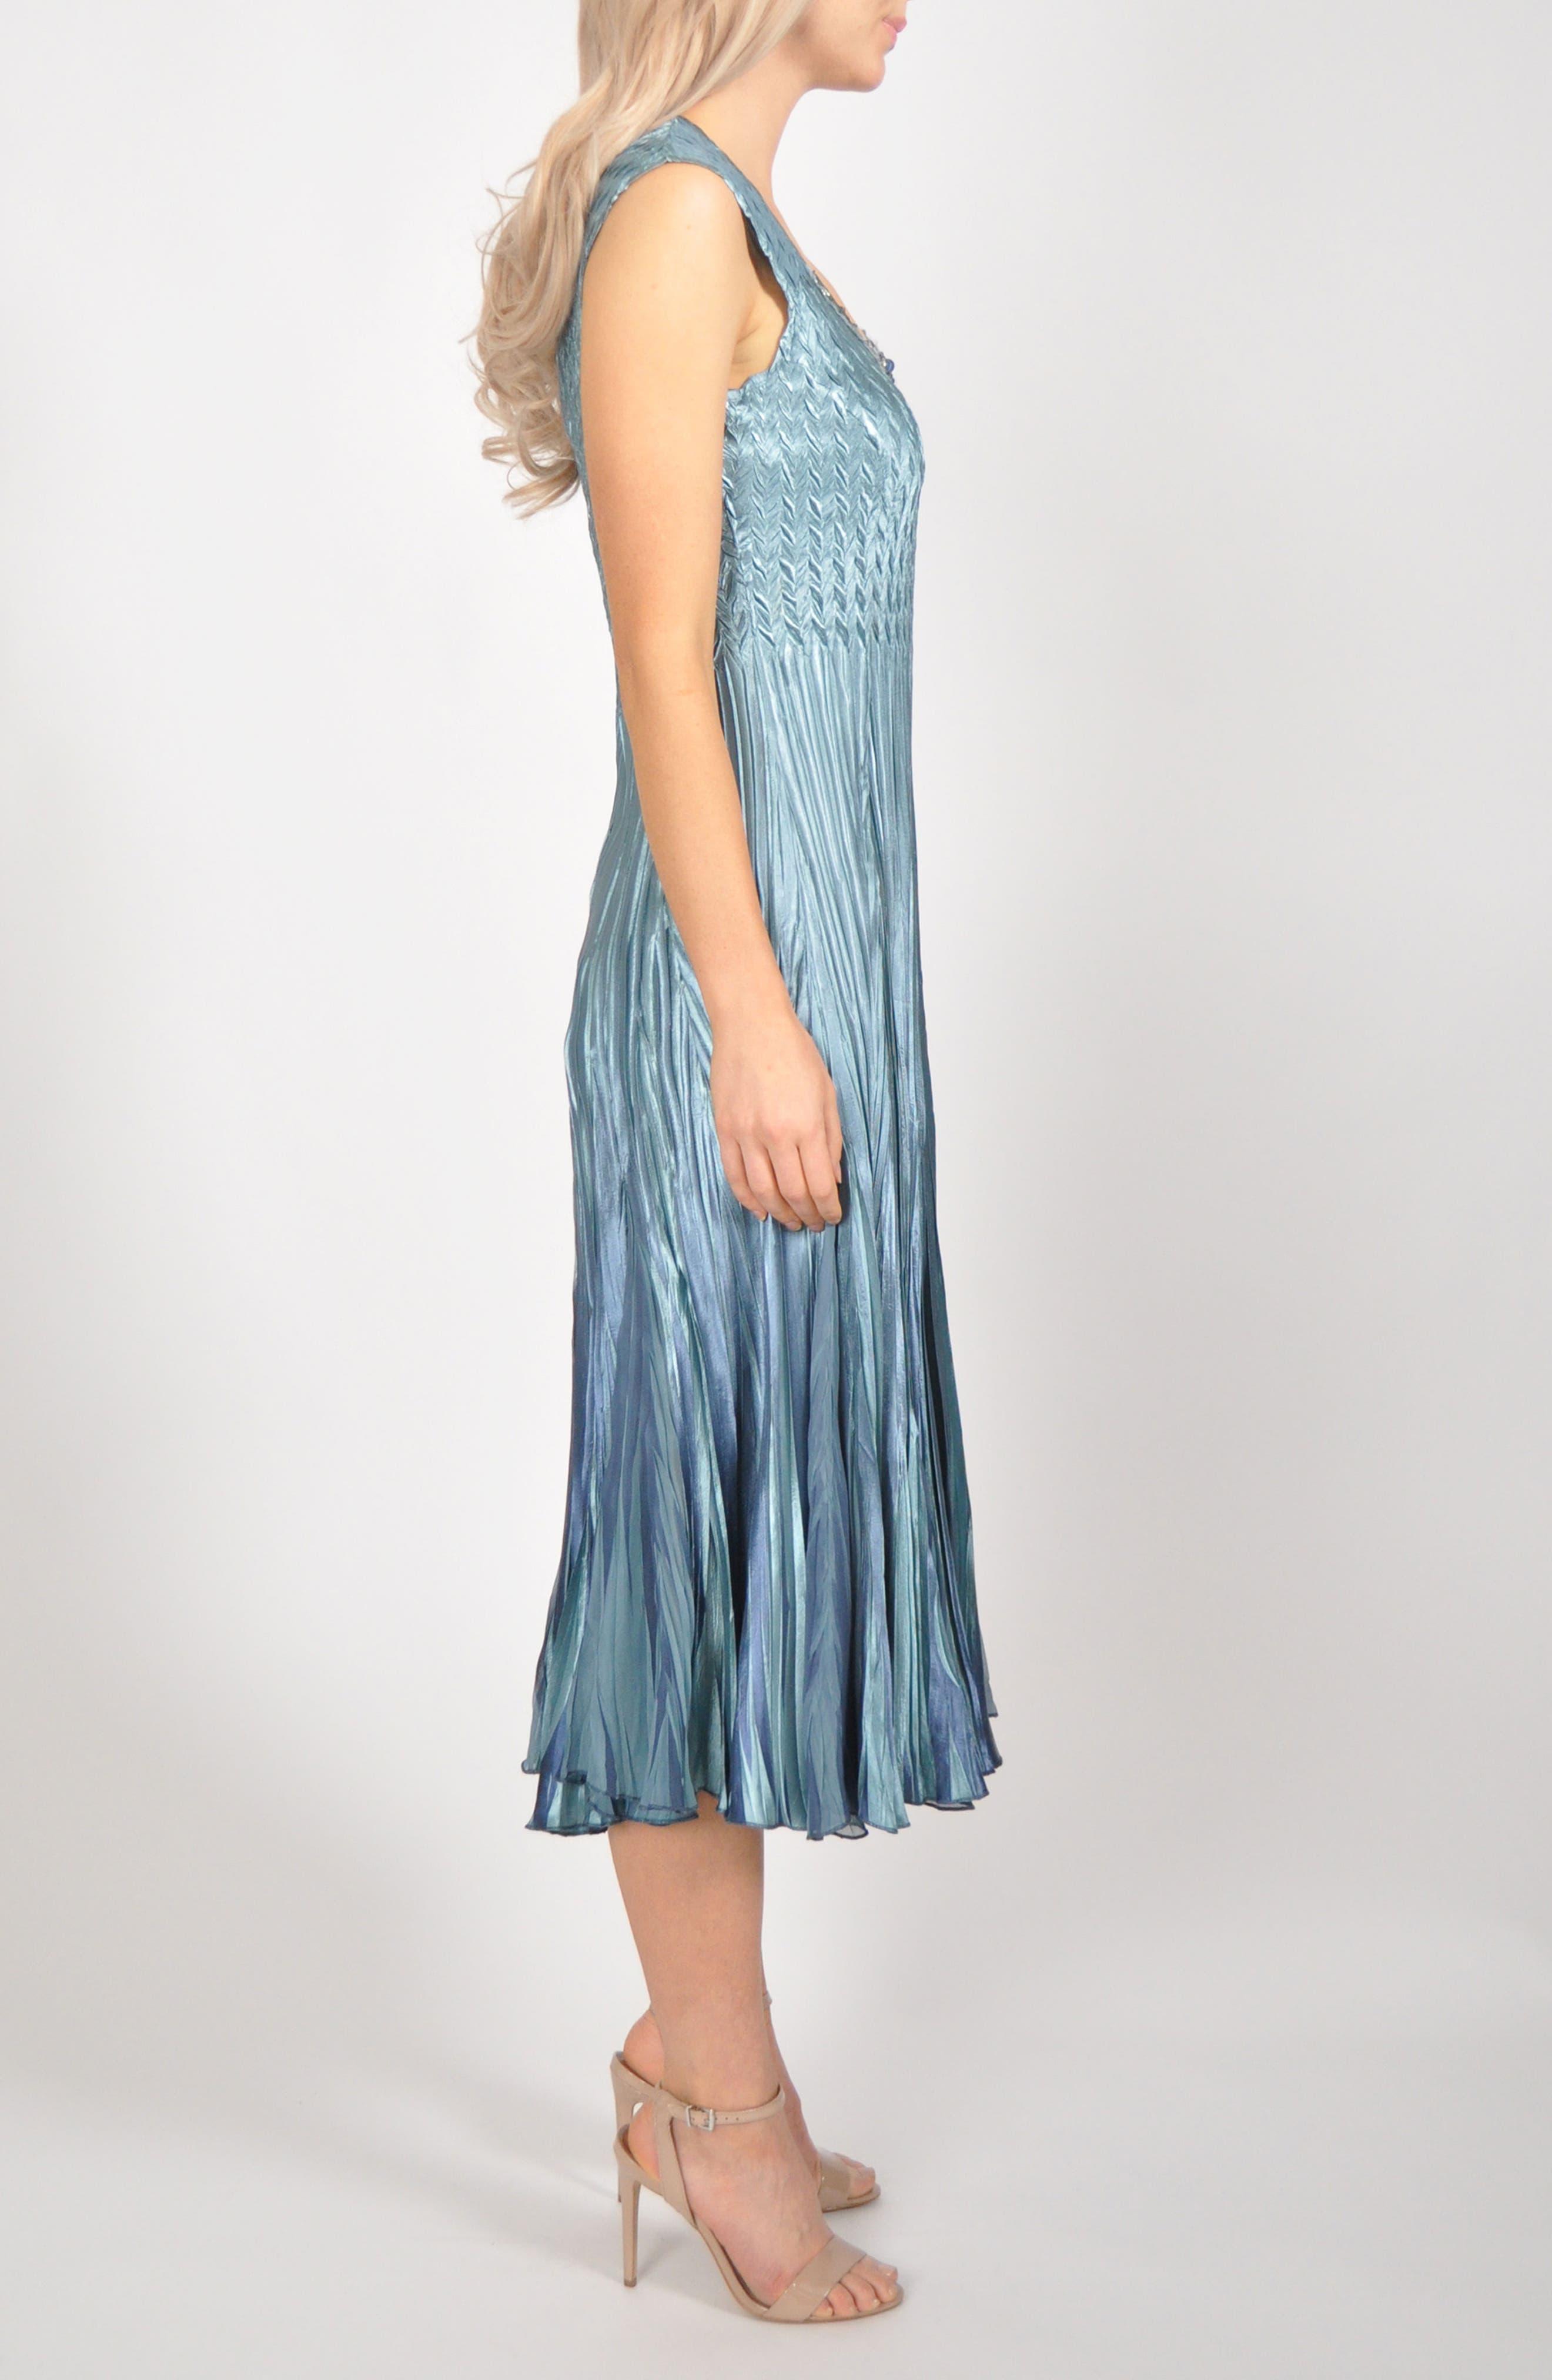 KOMAROV, Embellished Pleat Mixed Media Dress with Jacket, Alternate thumbnail 5, color, 405